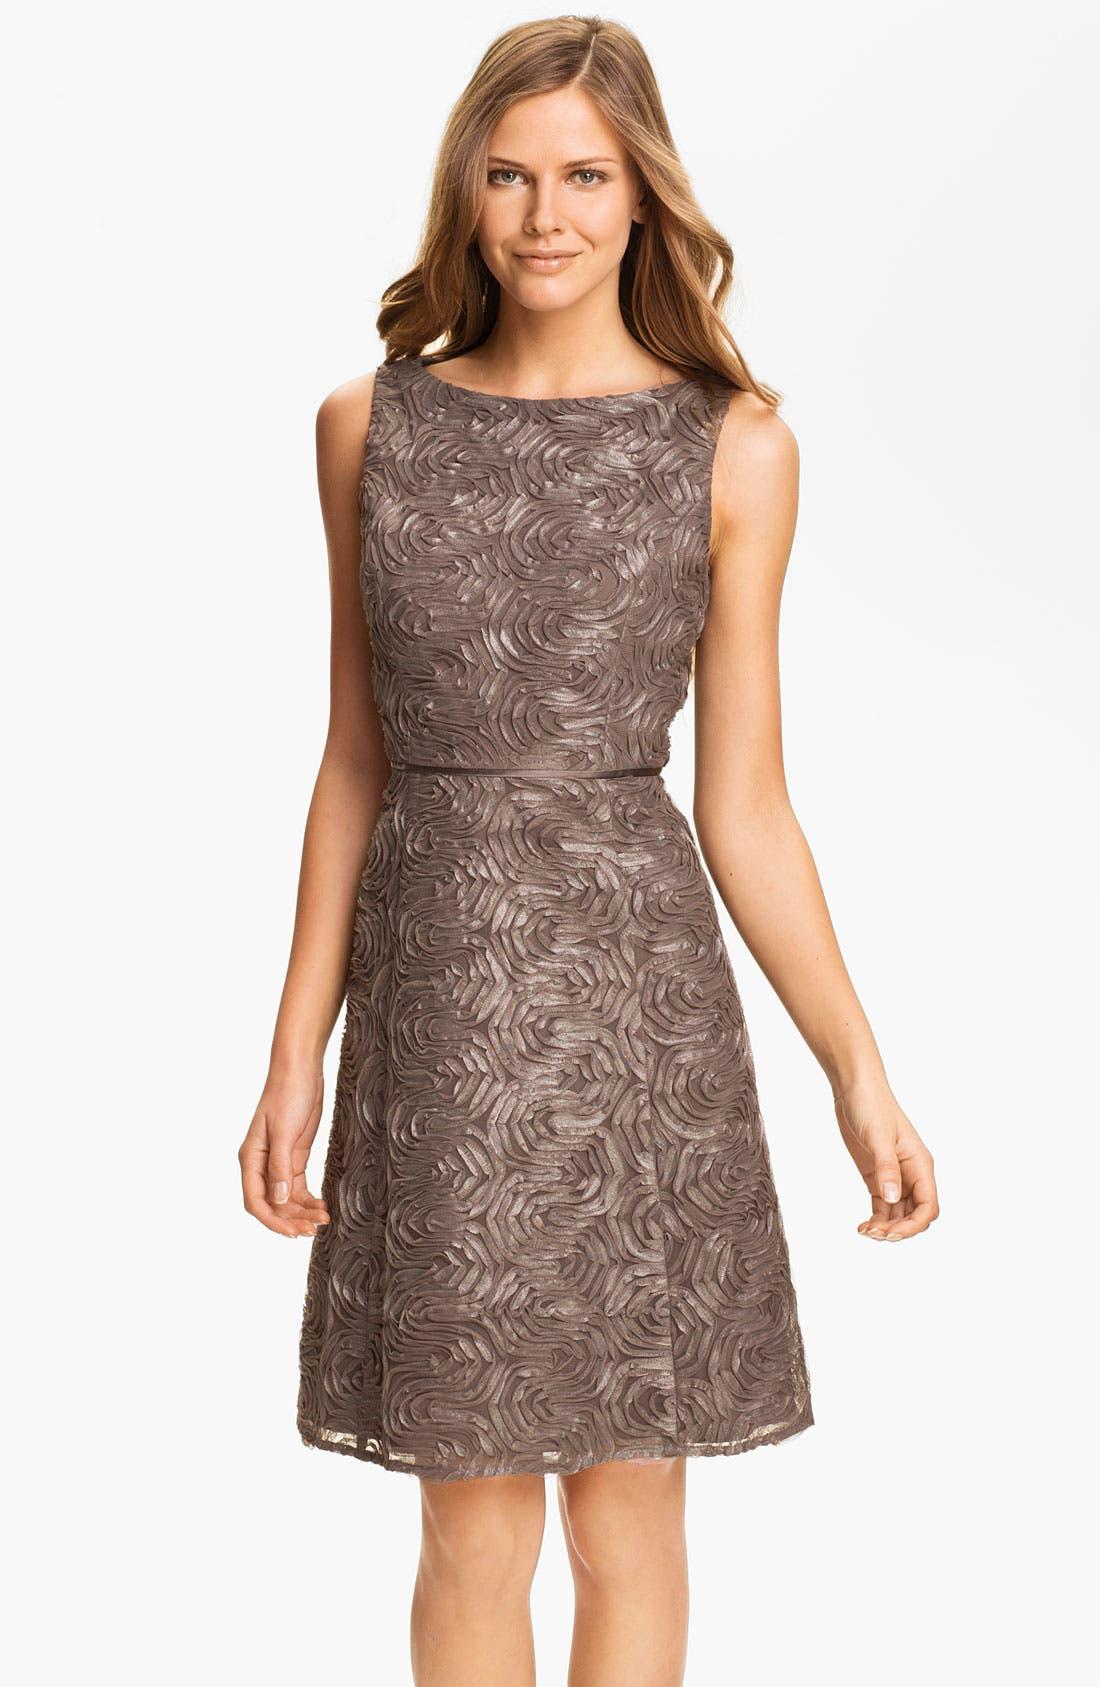 Alternate Image 1 Selected - Adrianna Papell Metallic Soutache A-Line Dress